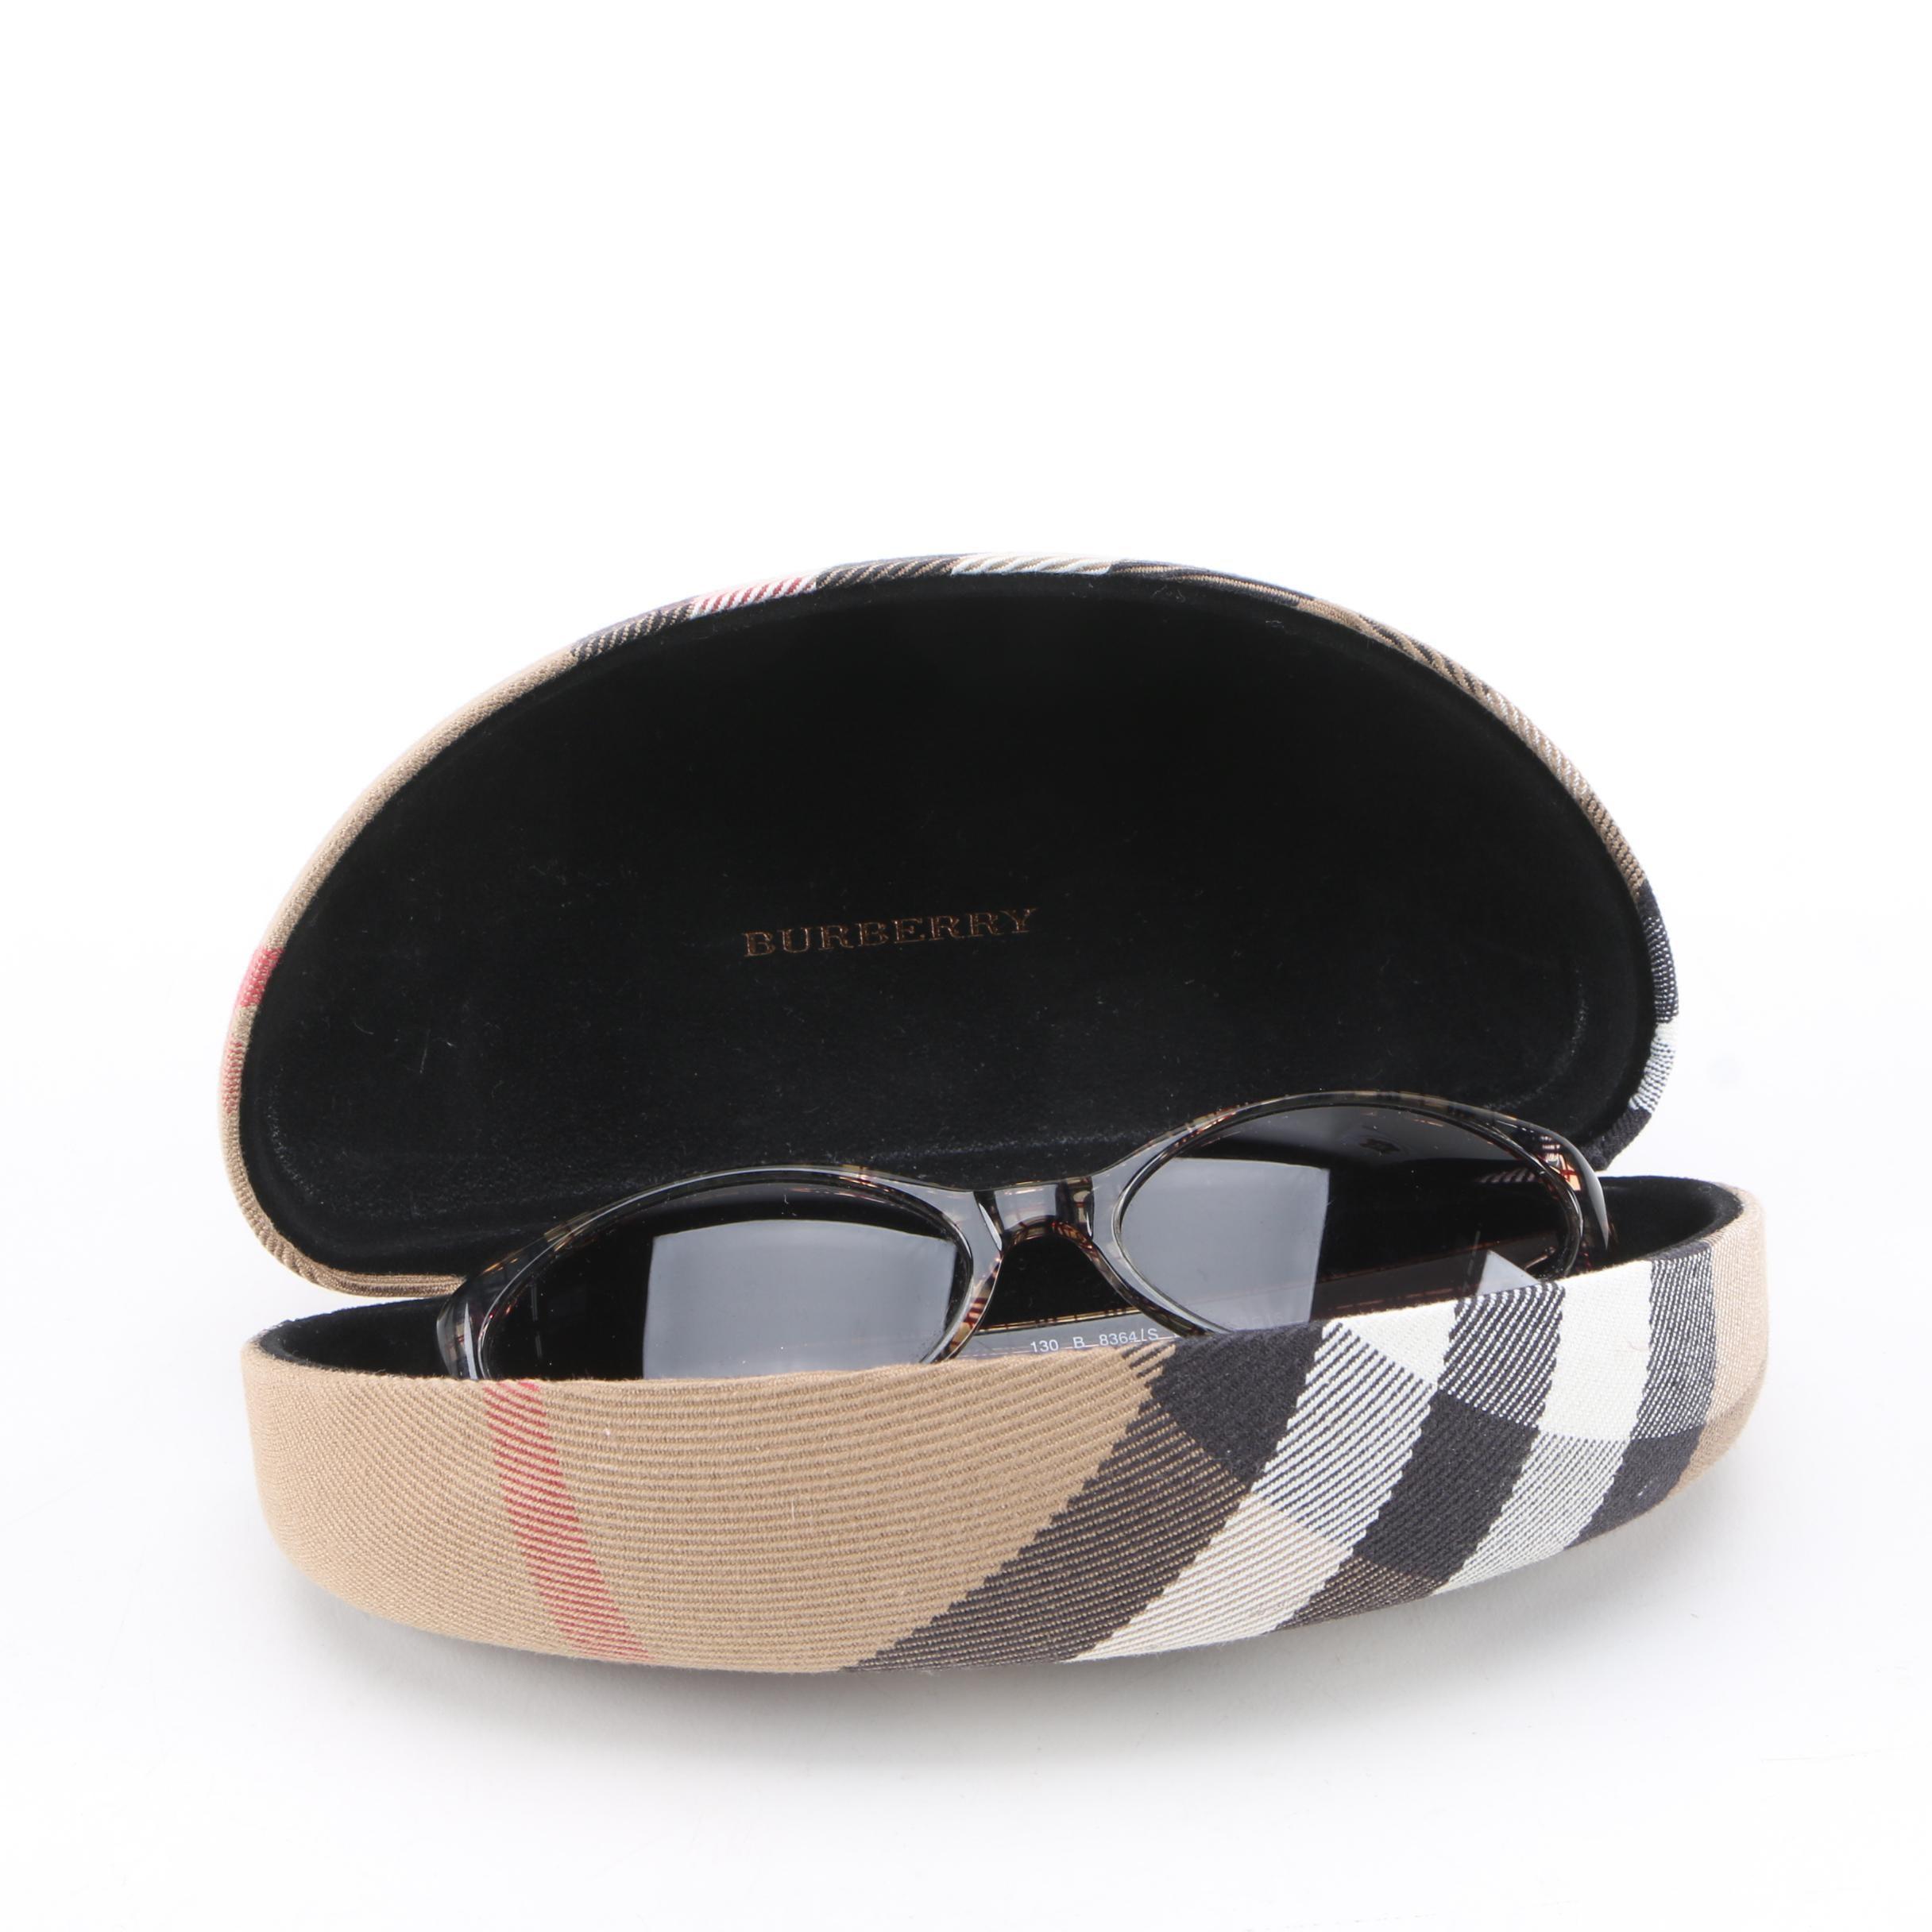 Burberry by Safilo Plaid Check Sunglasses with Case